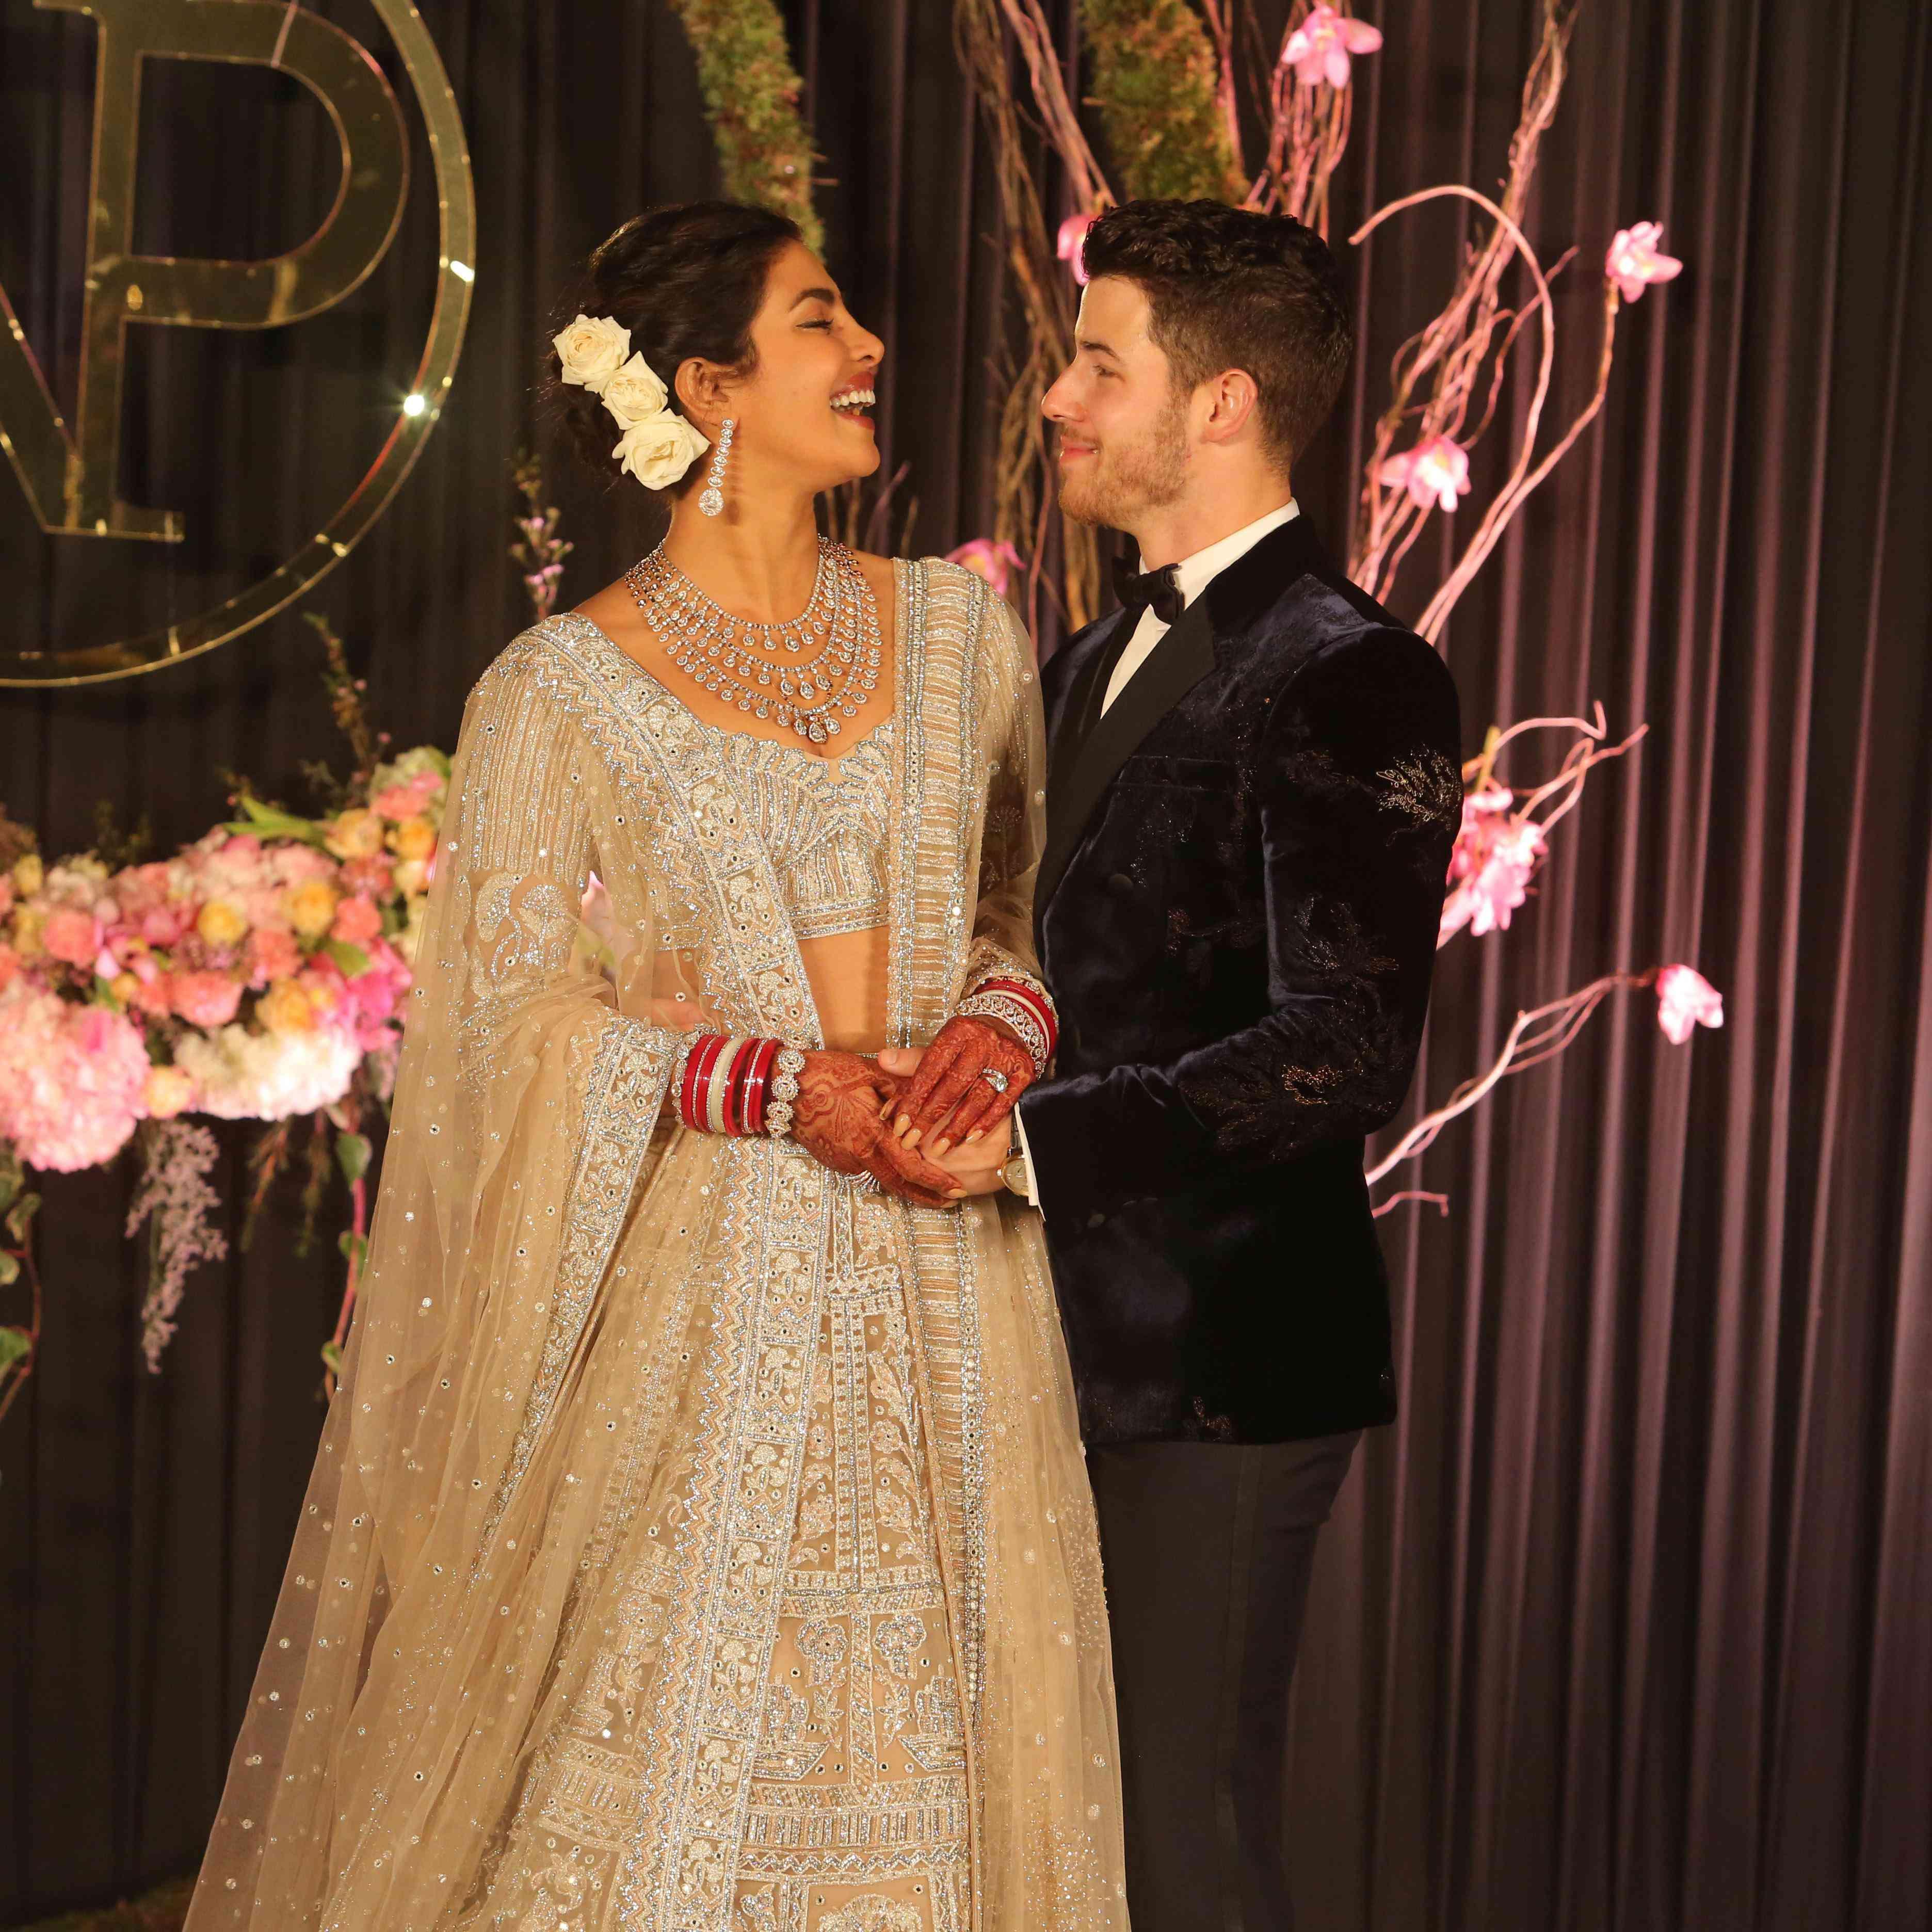 Priyanka Chopra Wedding.Priyanka Chopra Admits She And Husband Nick Jonas Experienced